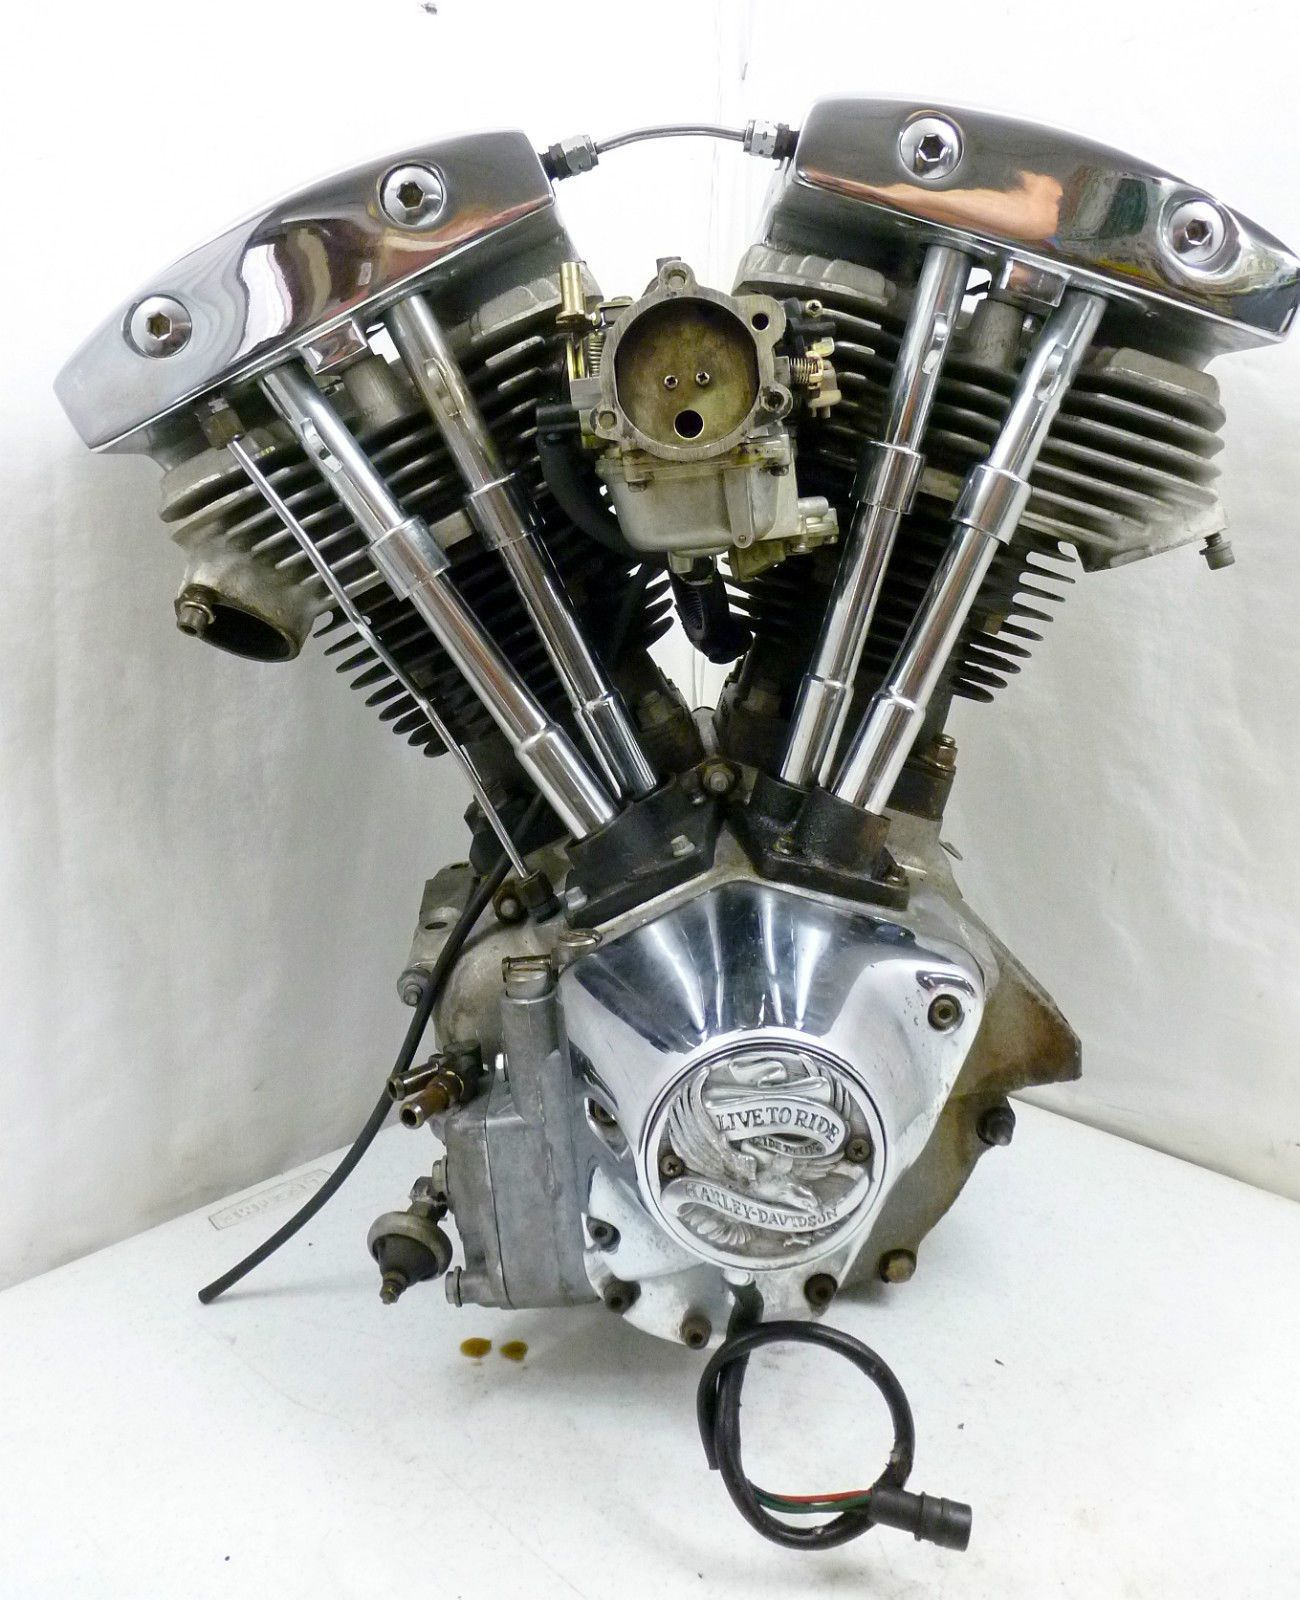 Shovelhead Engine Diagram Blue Sea Add A Battery Wiring Oem Harley Davidson 1981 Flt Tour Glide 1340